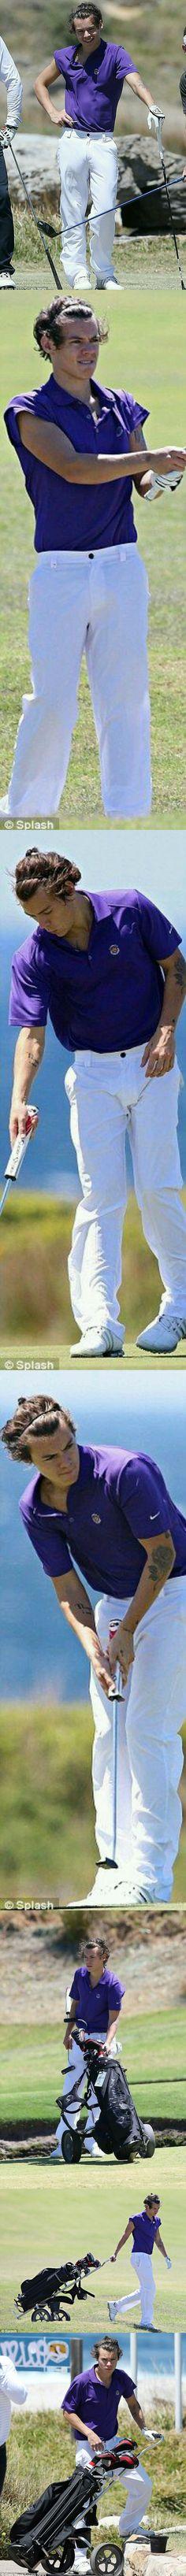 Harry Styles ❥ golfing part 2